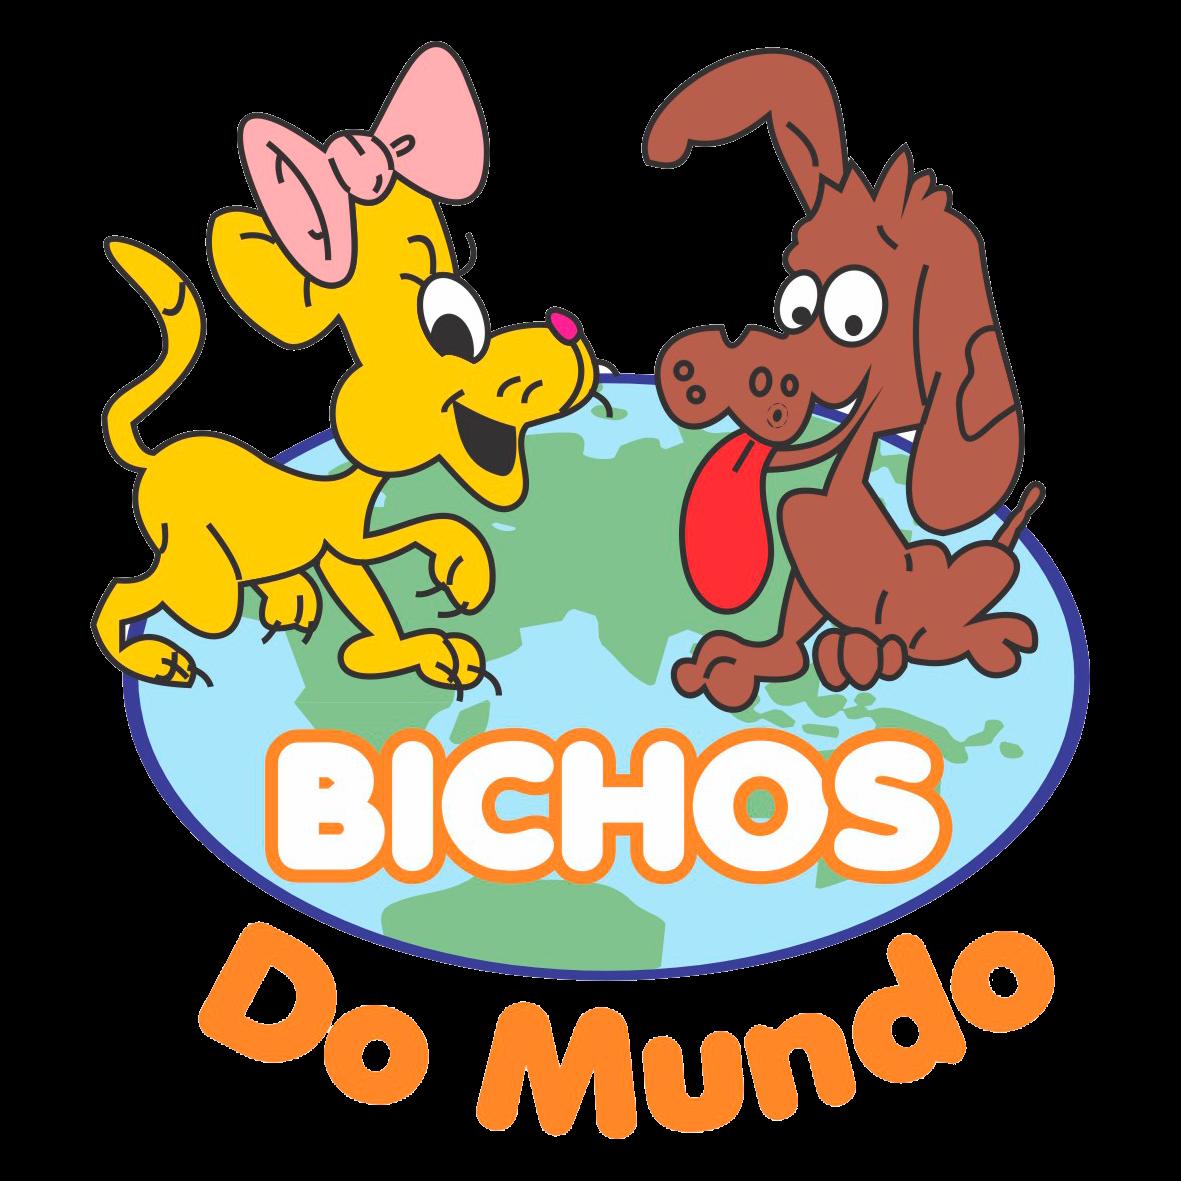 BICHOSDOMUNDO